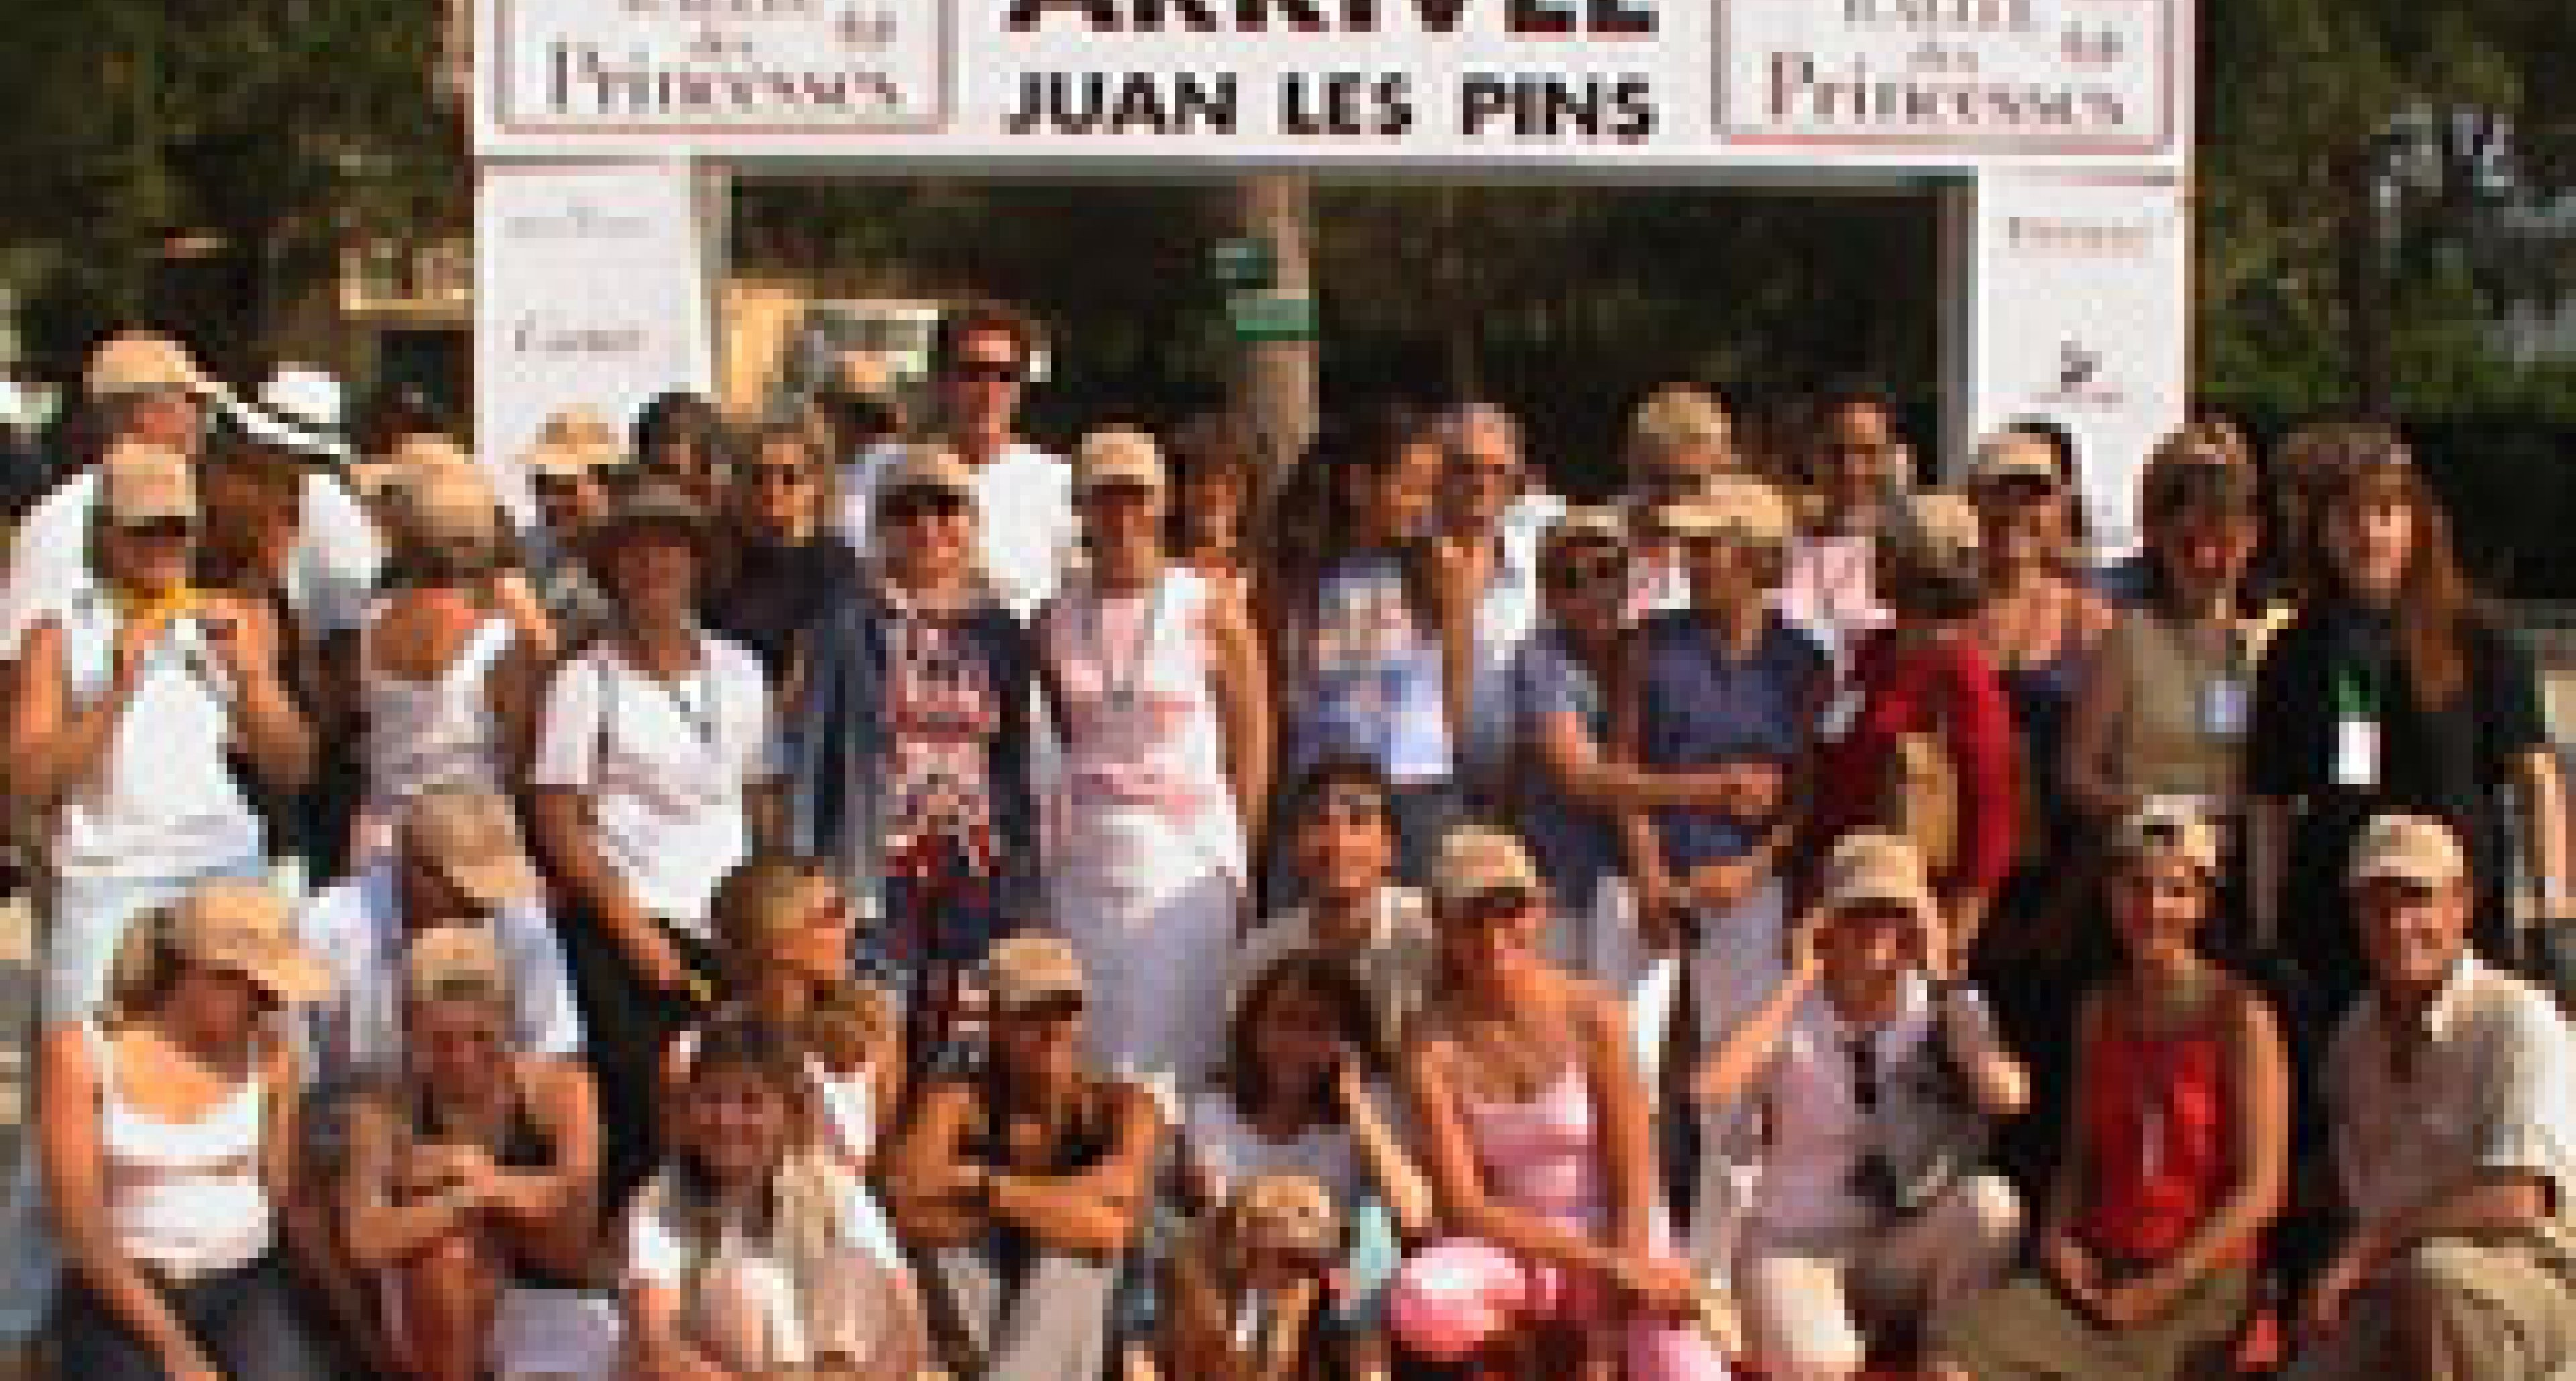 The Rallye des Princesses France June 2002